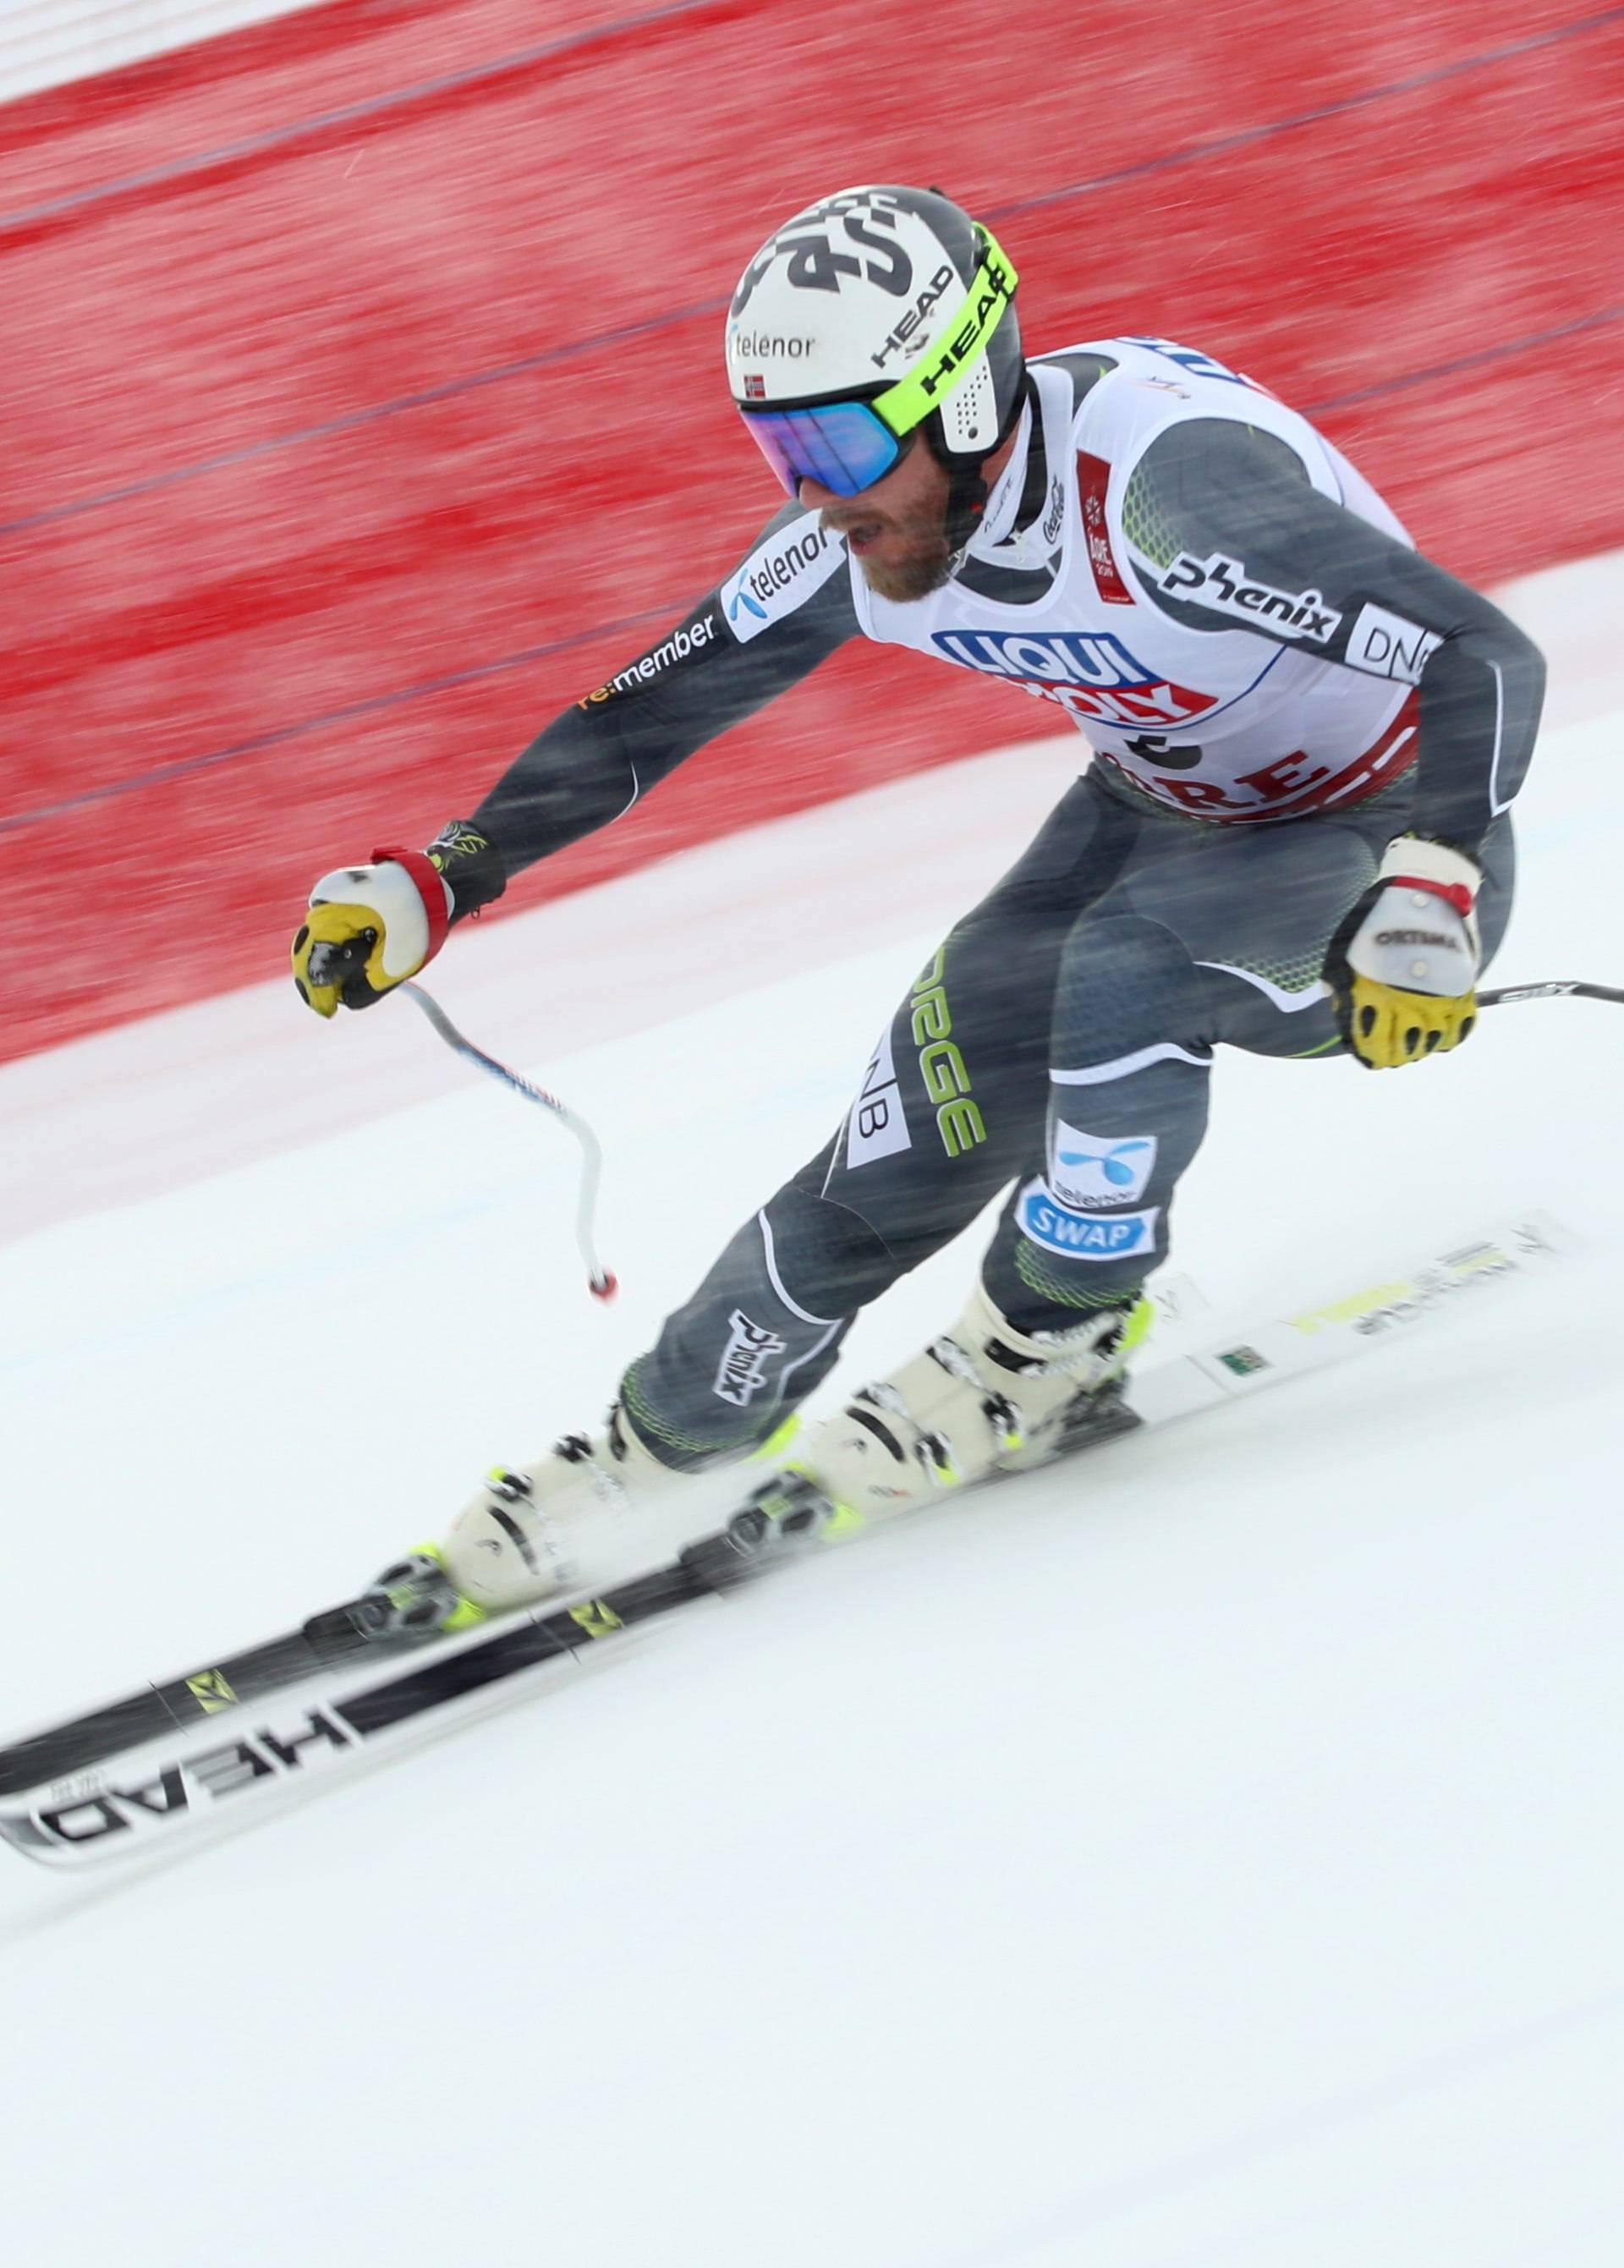 Alpine Skiing - FIS Alpine World Ski Championships - Men's Downhill